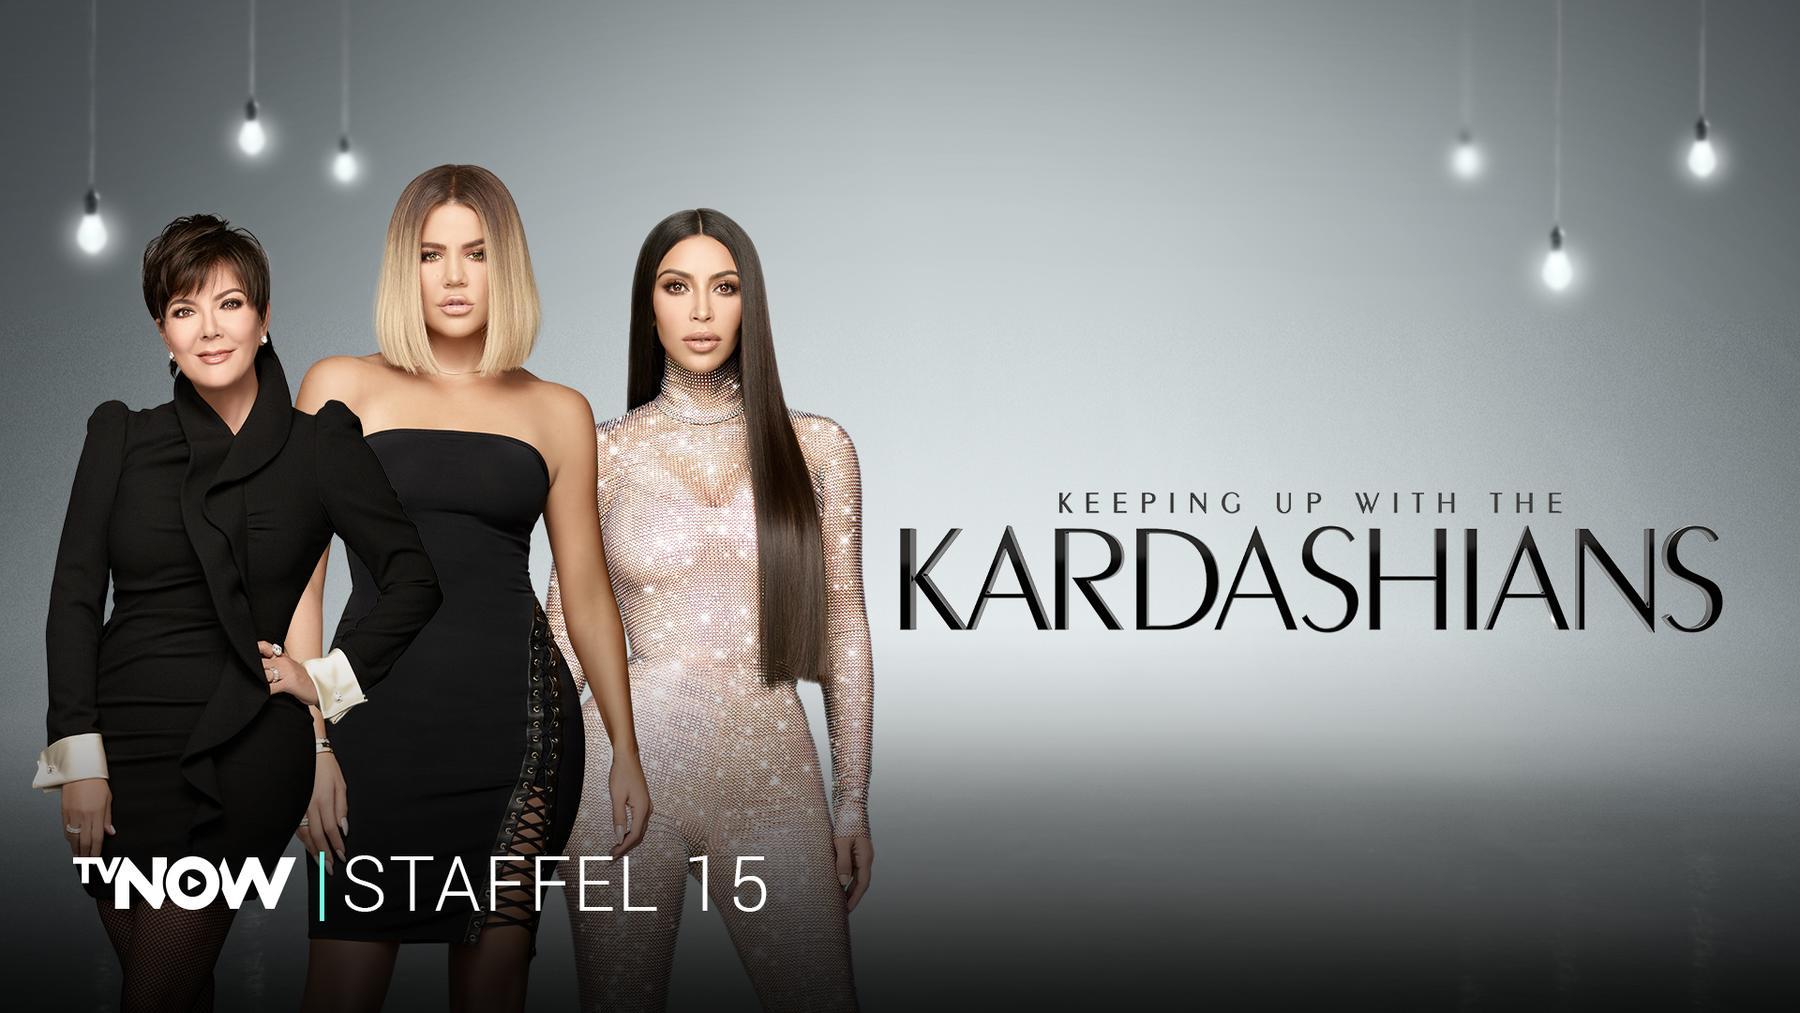 Staffel 15